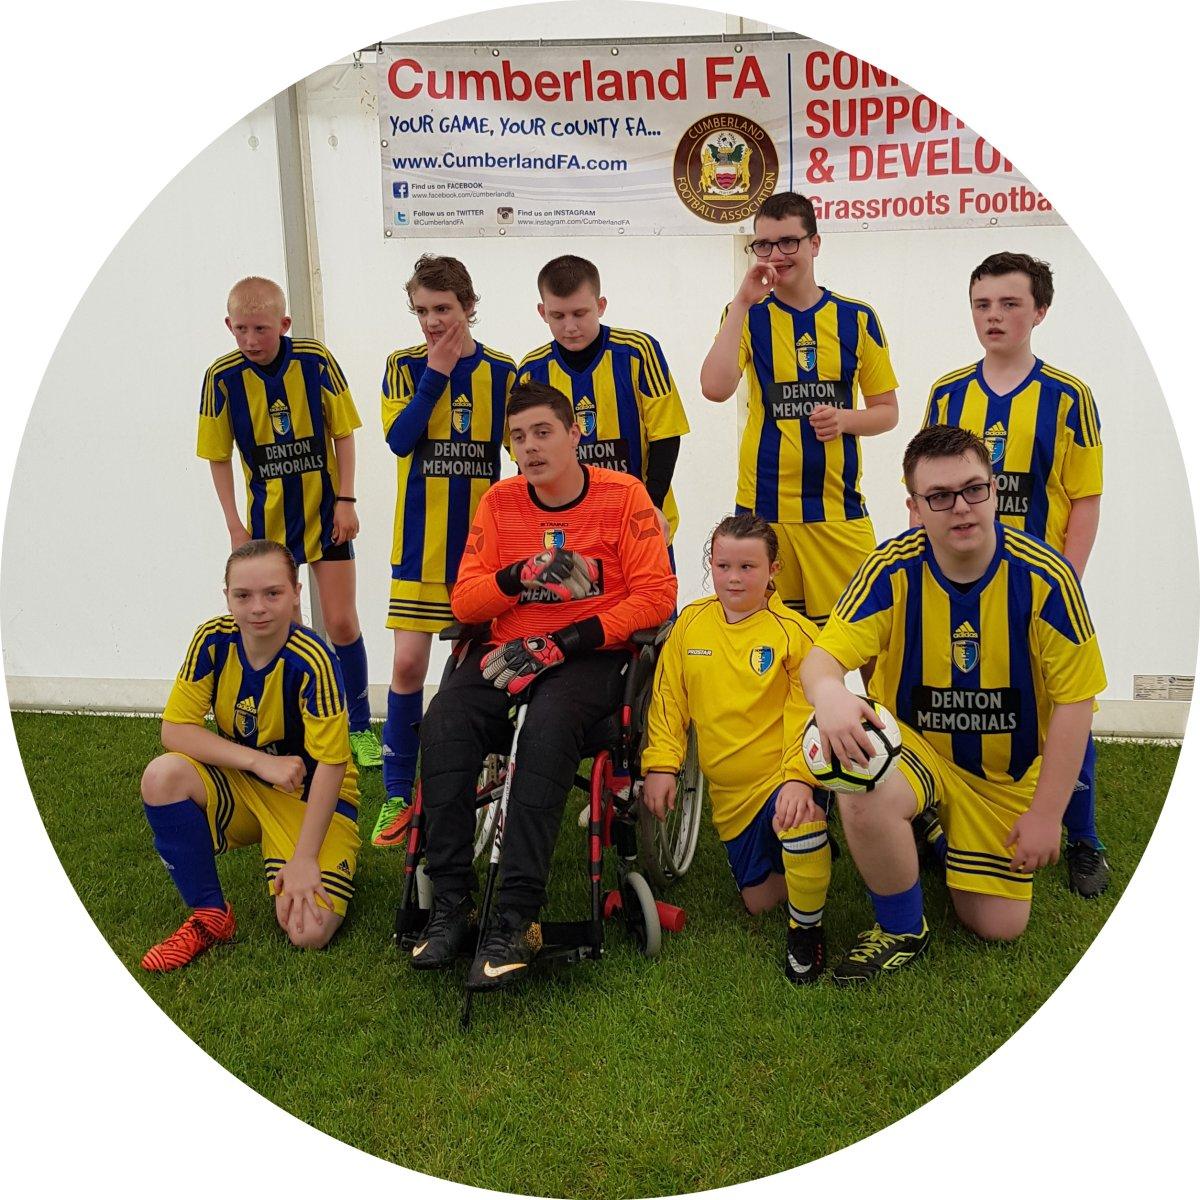 Carlisle Reivers Pan Disability Football's profile pic